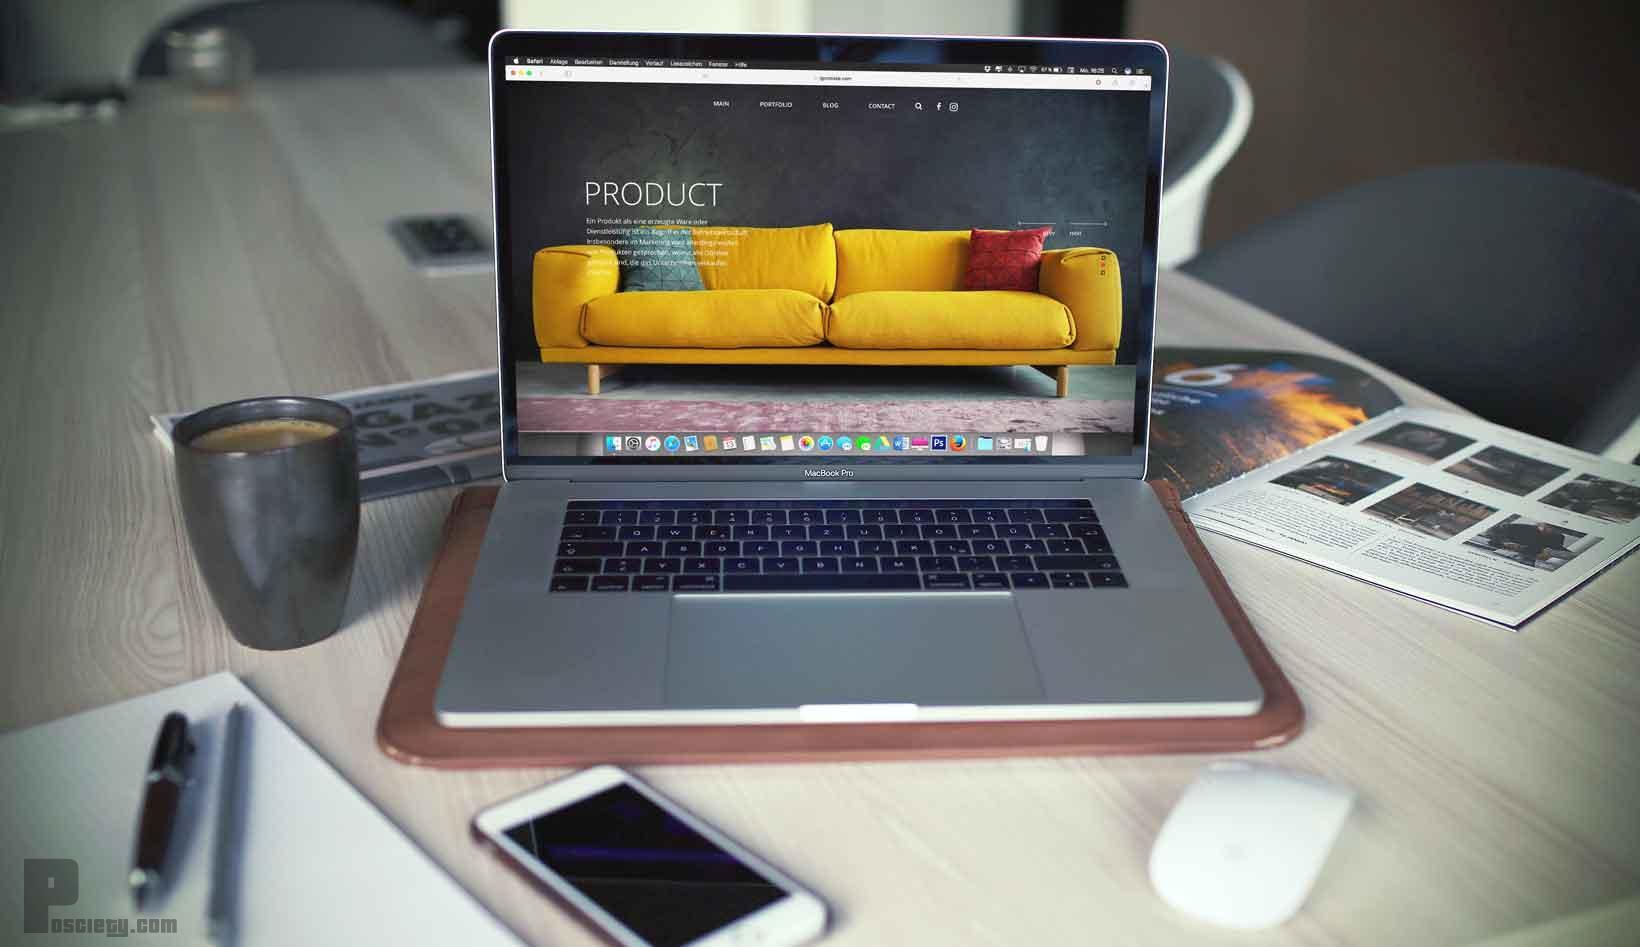 cara membuat multiple background image css - posciety